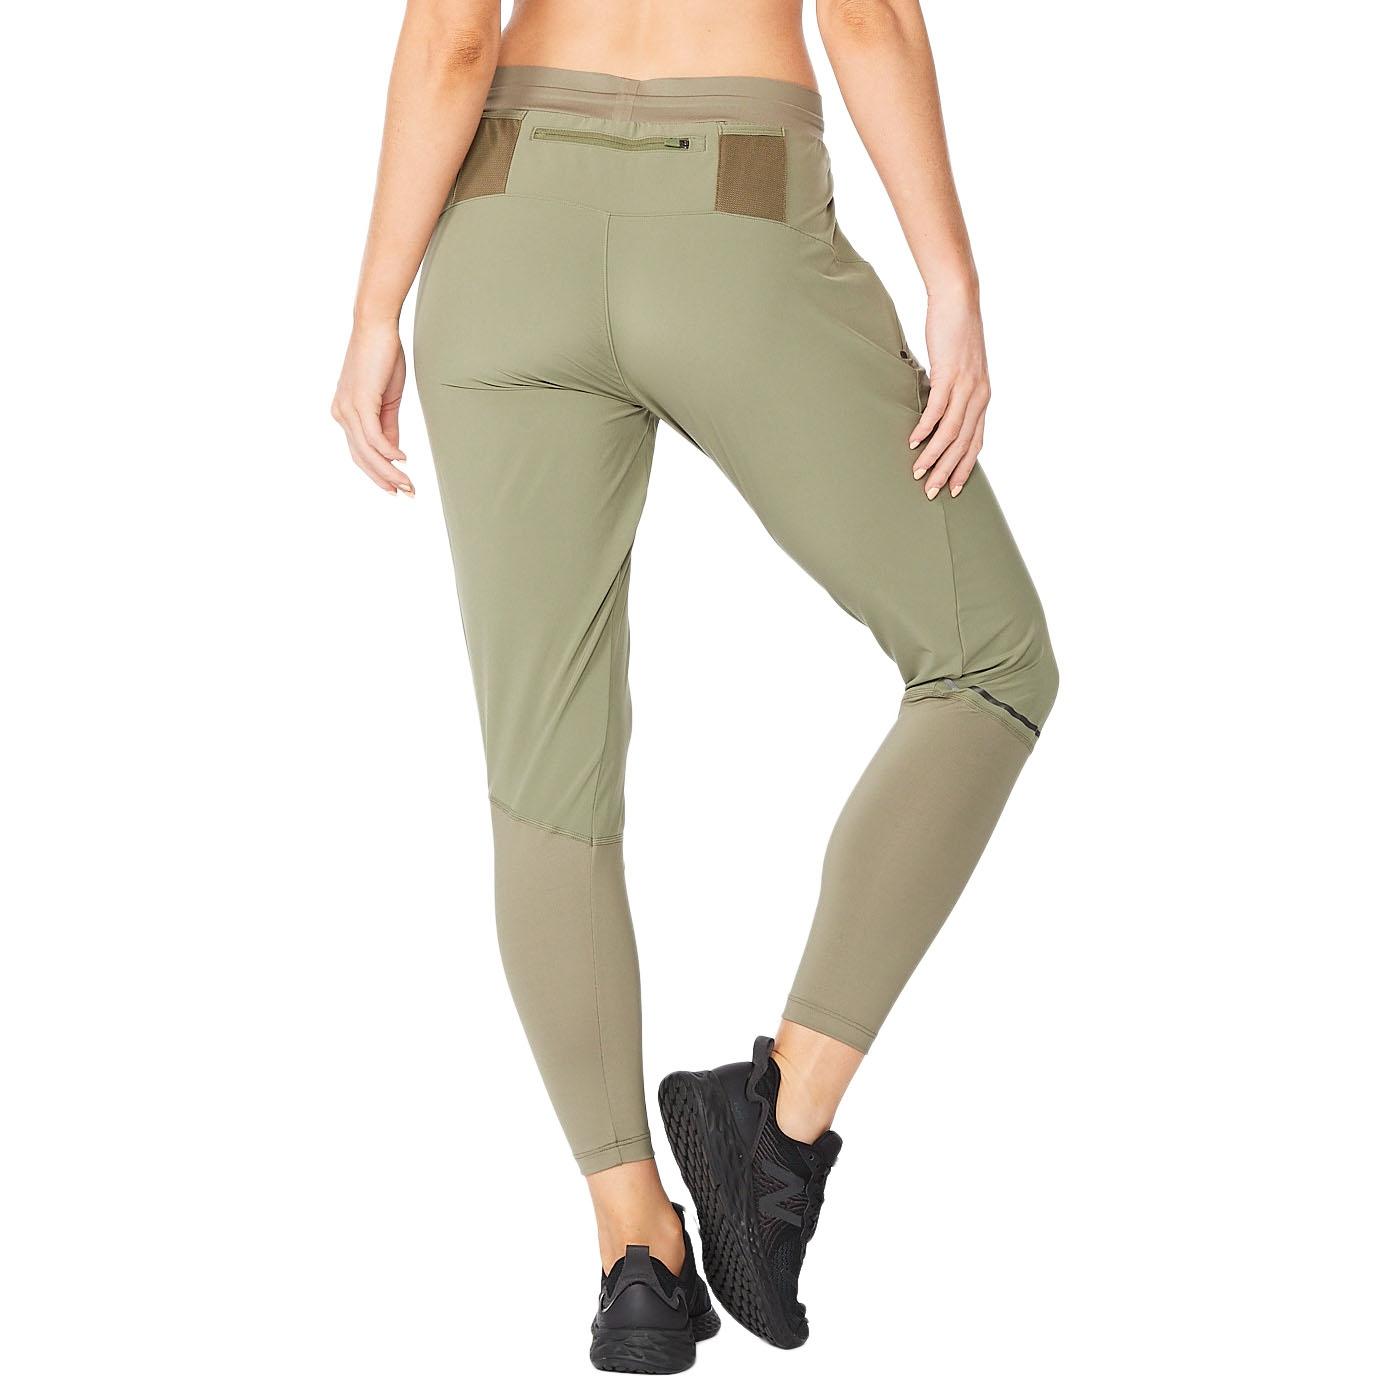 Imagen de 2XU Light Speed Jogger Pantalon para mujer - alpine/black reflective